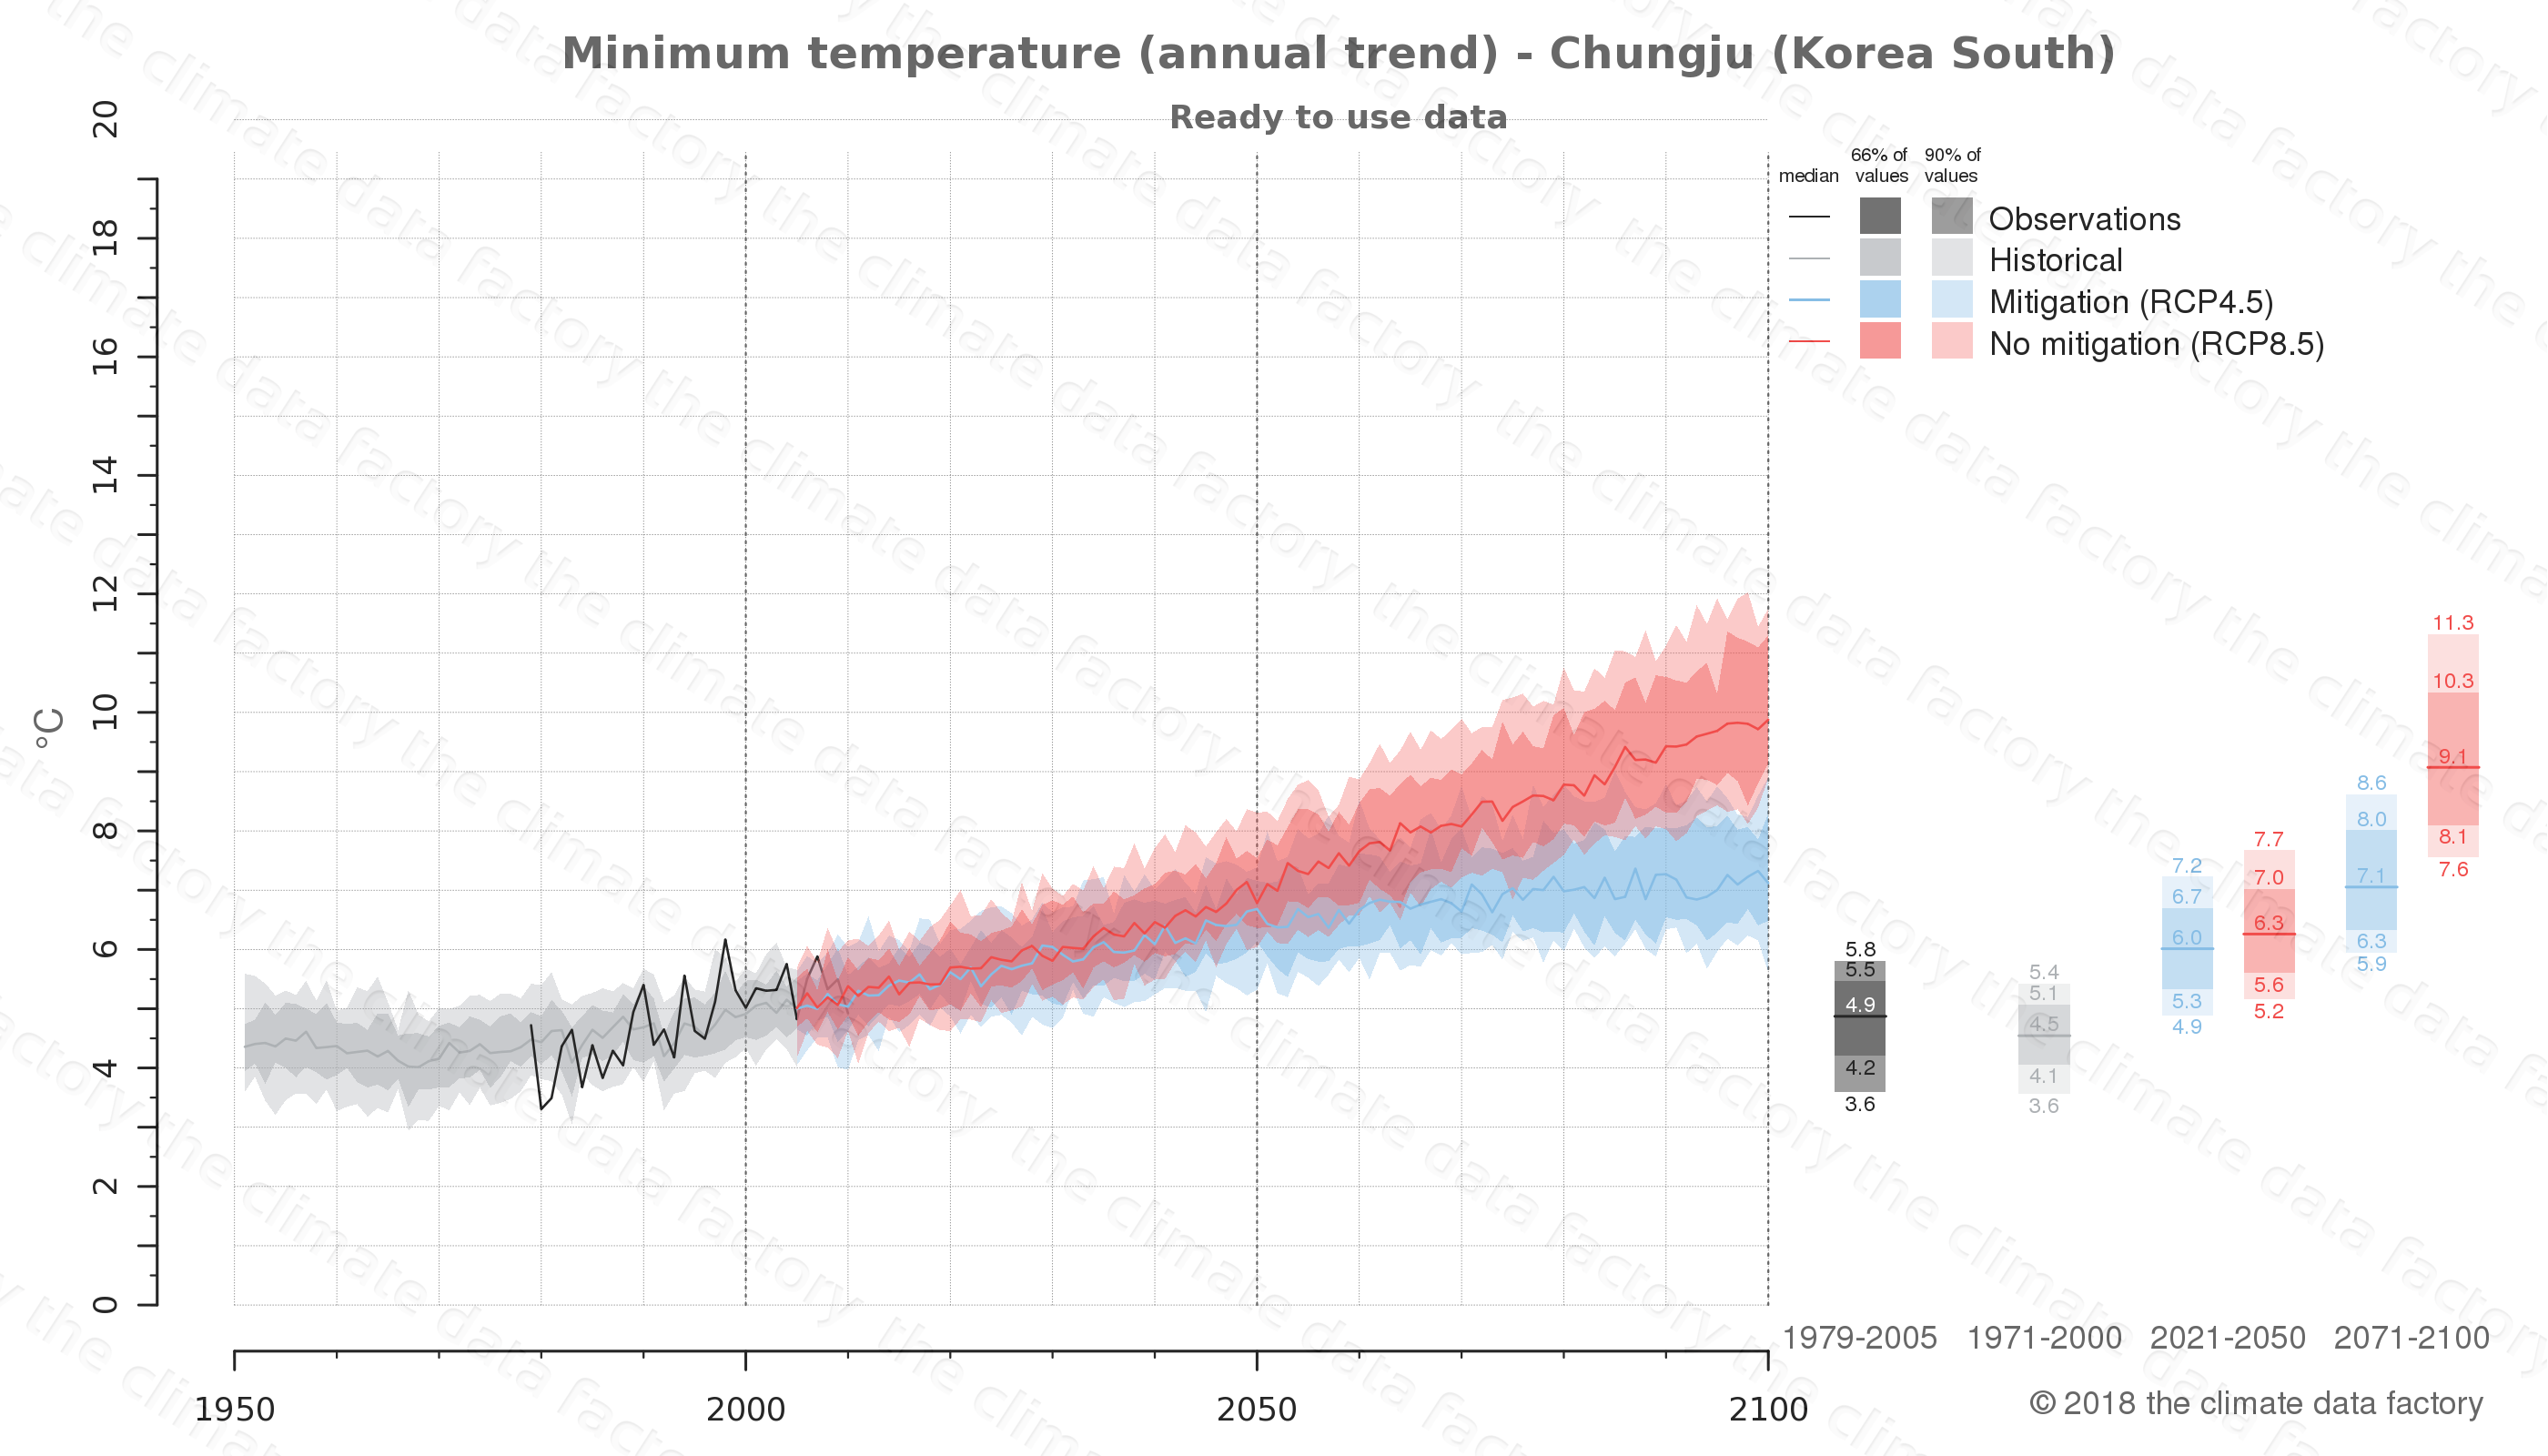 climate change data policy adaptation climate graph city data minimum-temperature chungju south korea